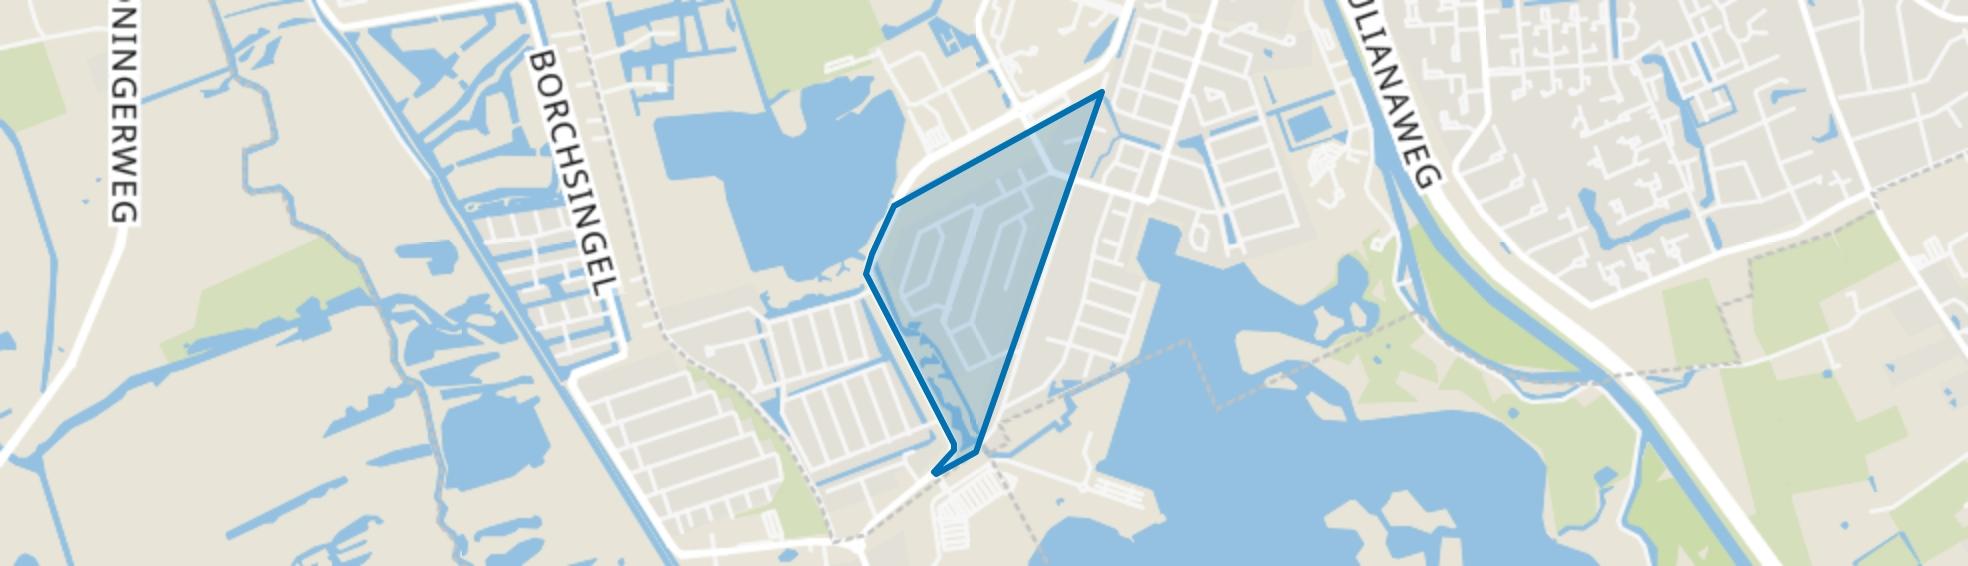 Hoornse Park, Groningen map